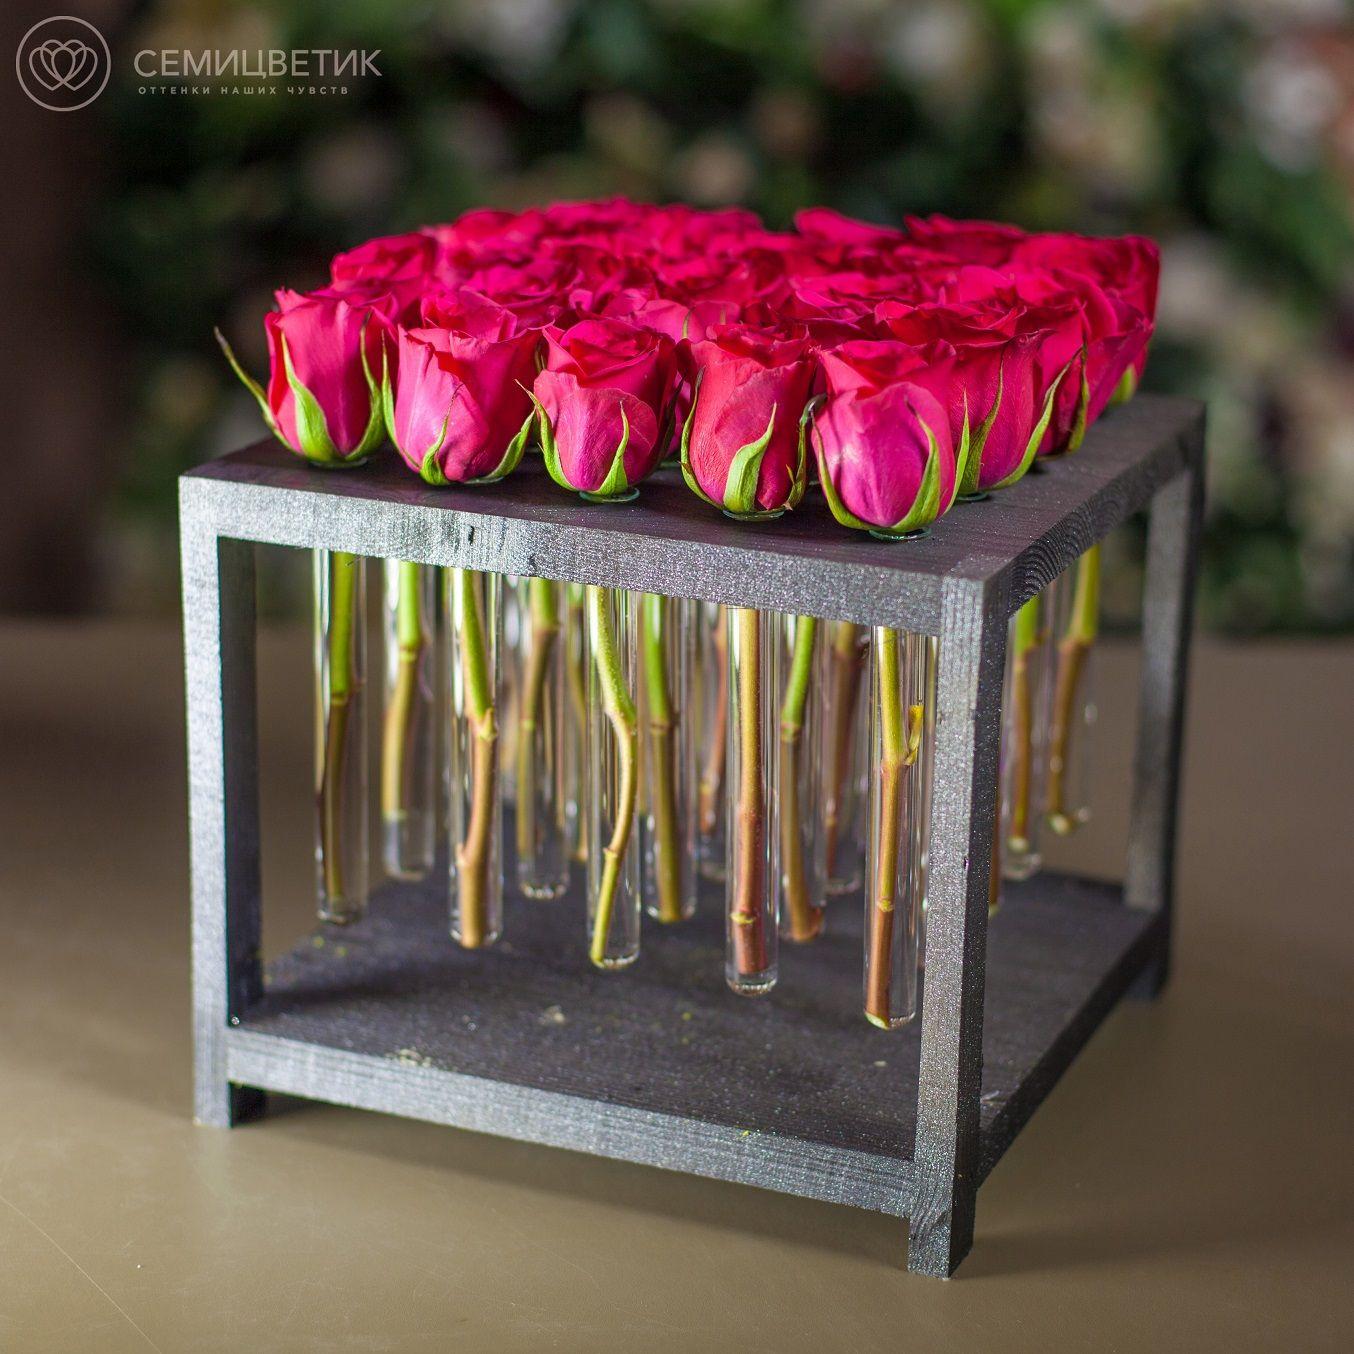 25 розовых кенийских роз в пробирках фото